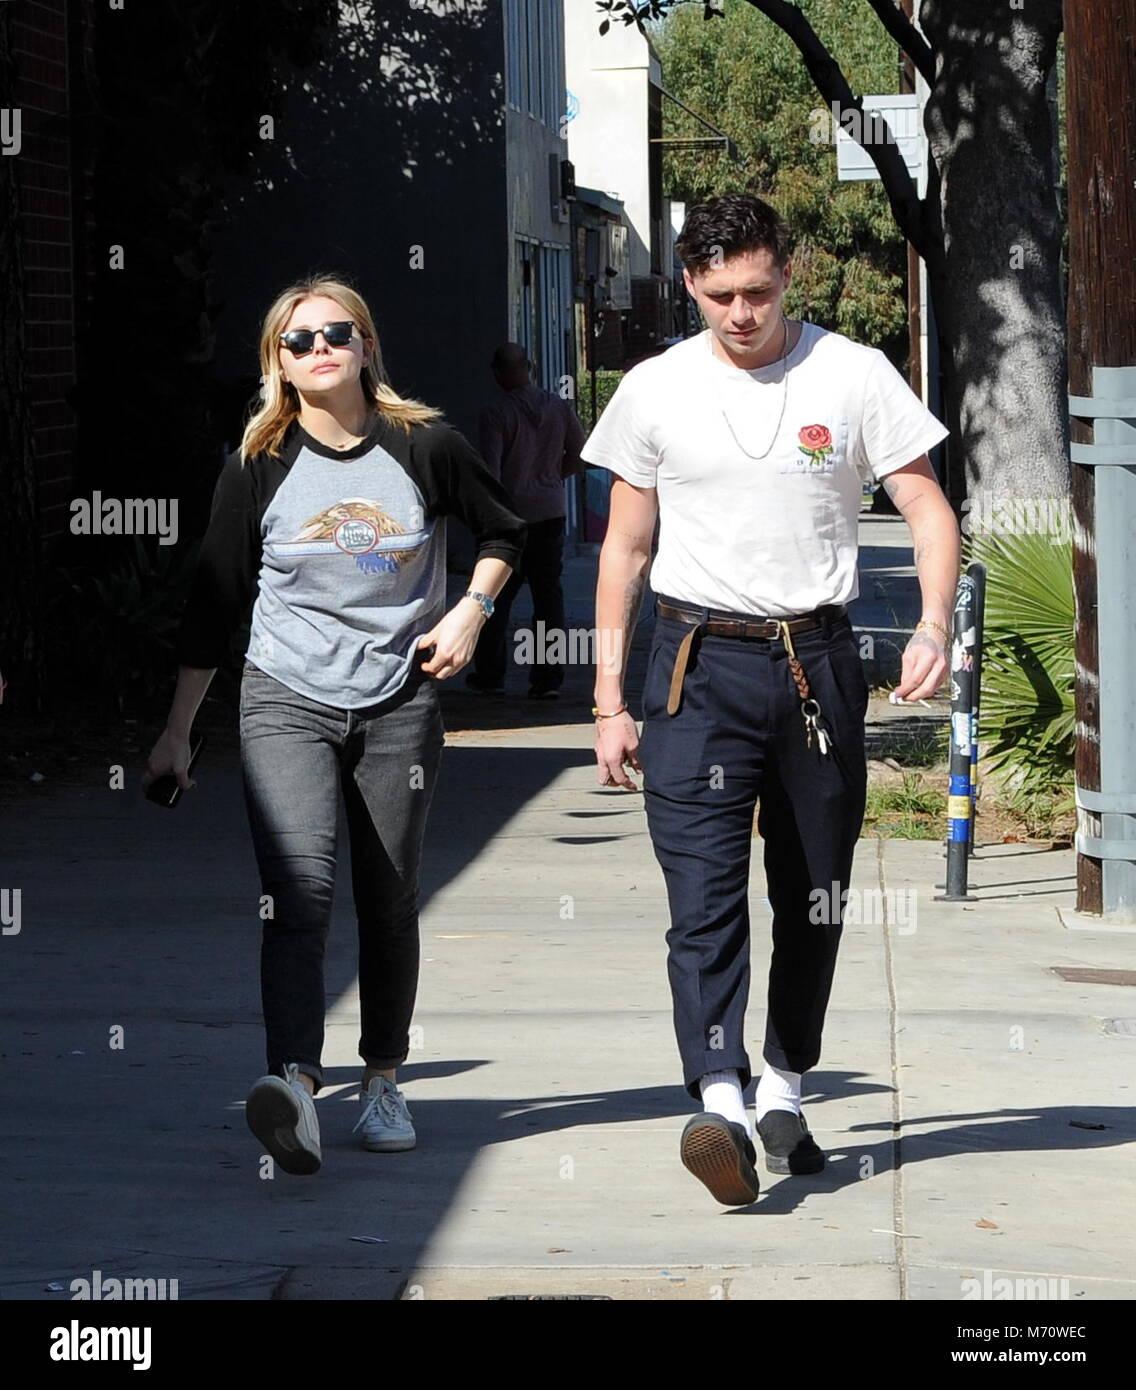 Beckham dating Chloe online dating profil strategi